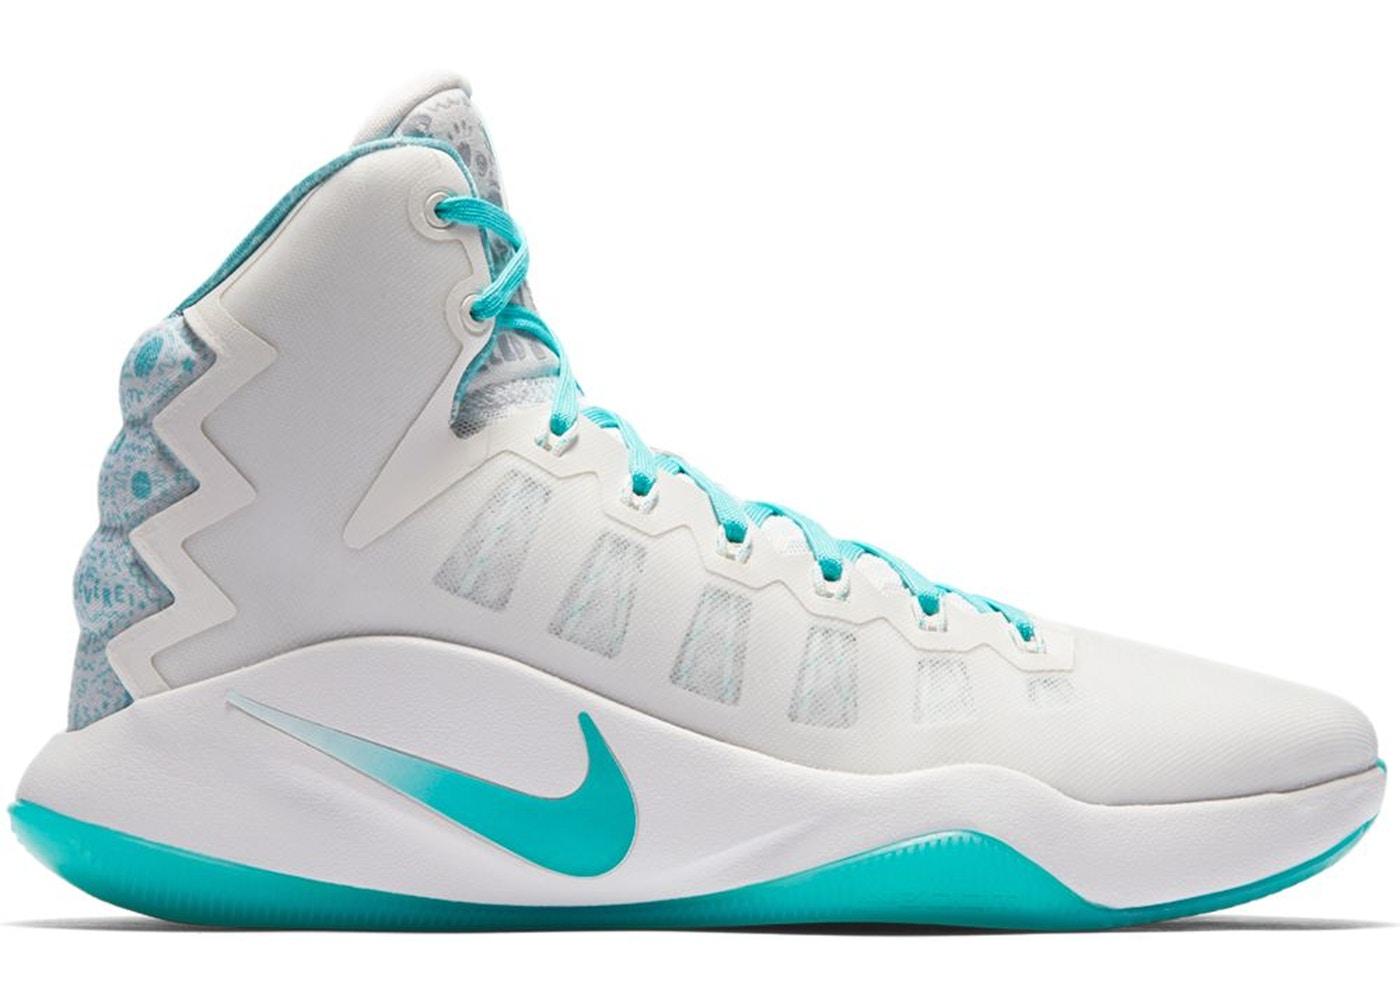 Memoria Pef Ejecutable  Nike Hyperdunk 2016 Elena Delle Donne - 869484-999